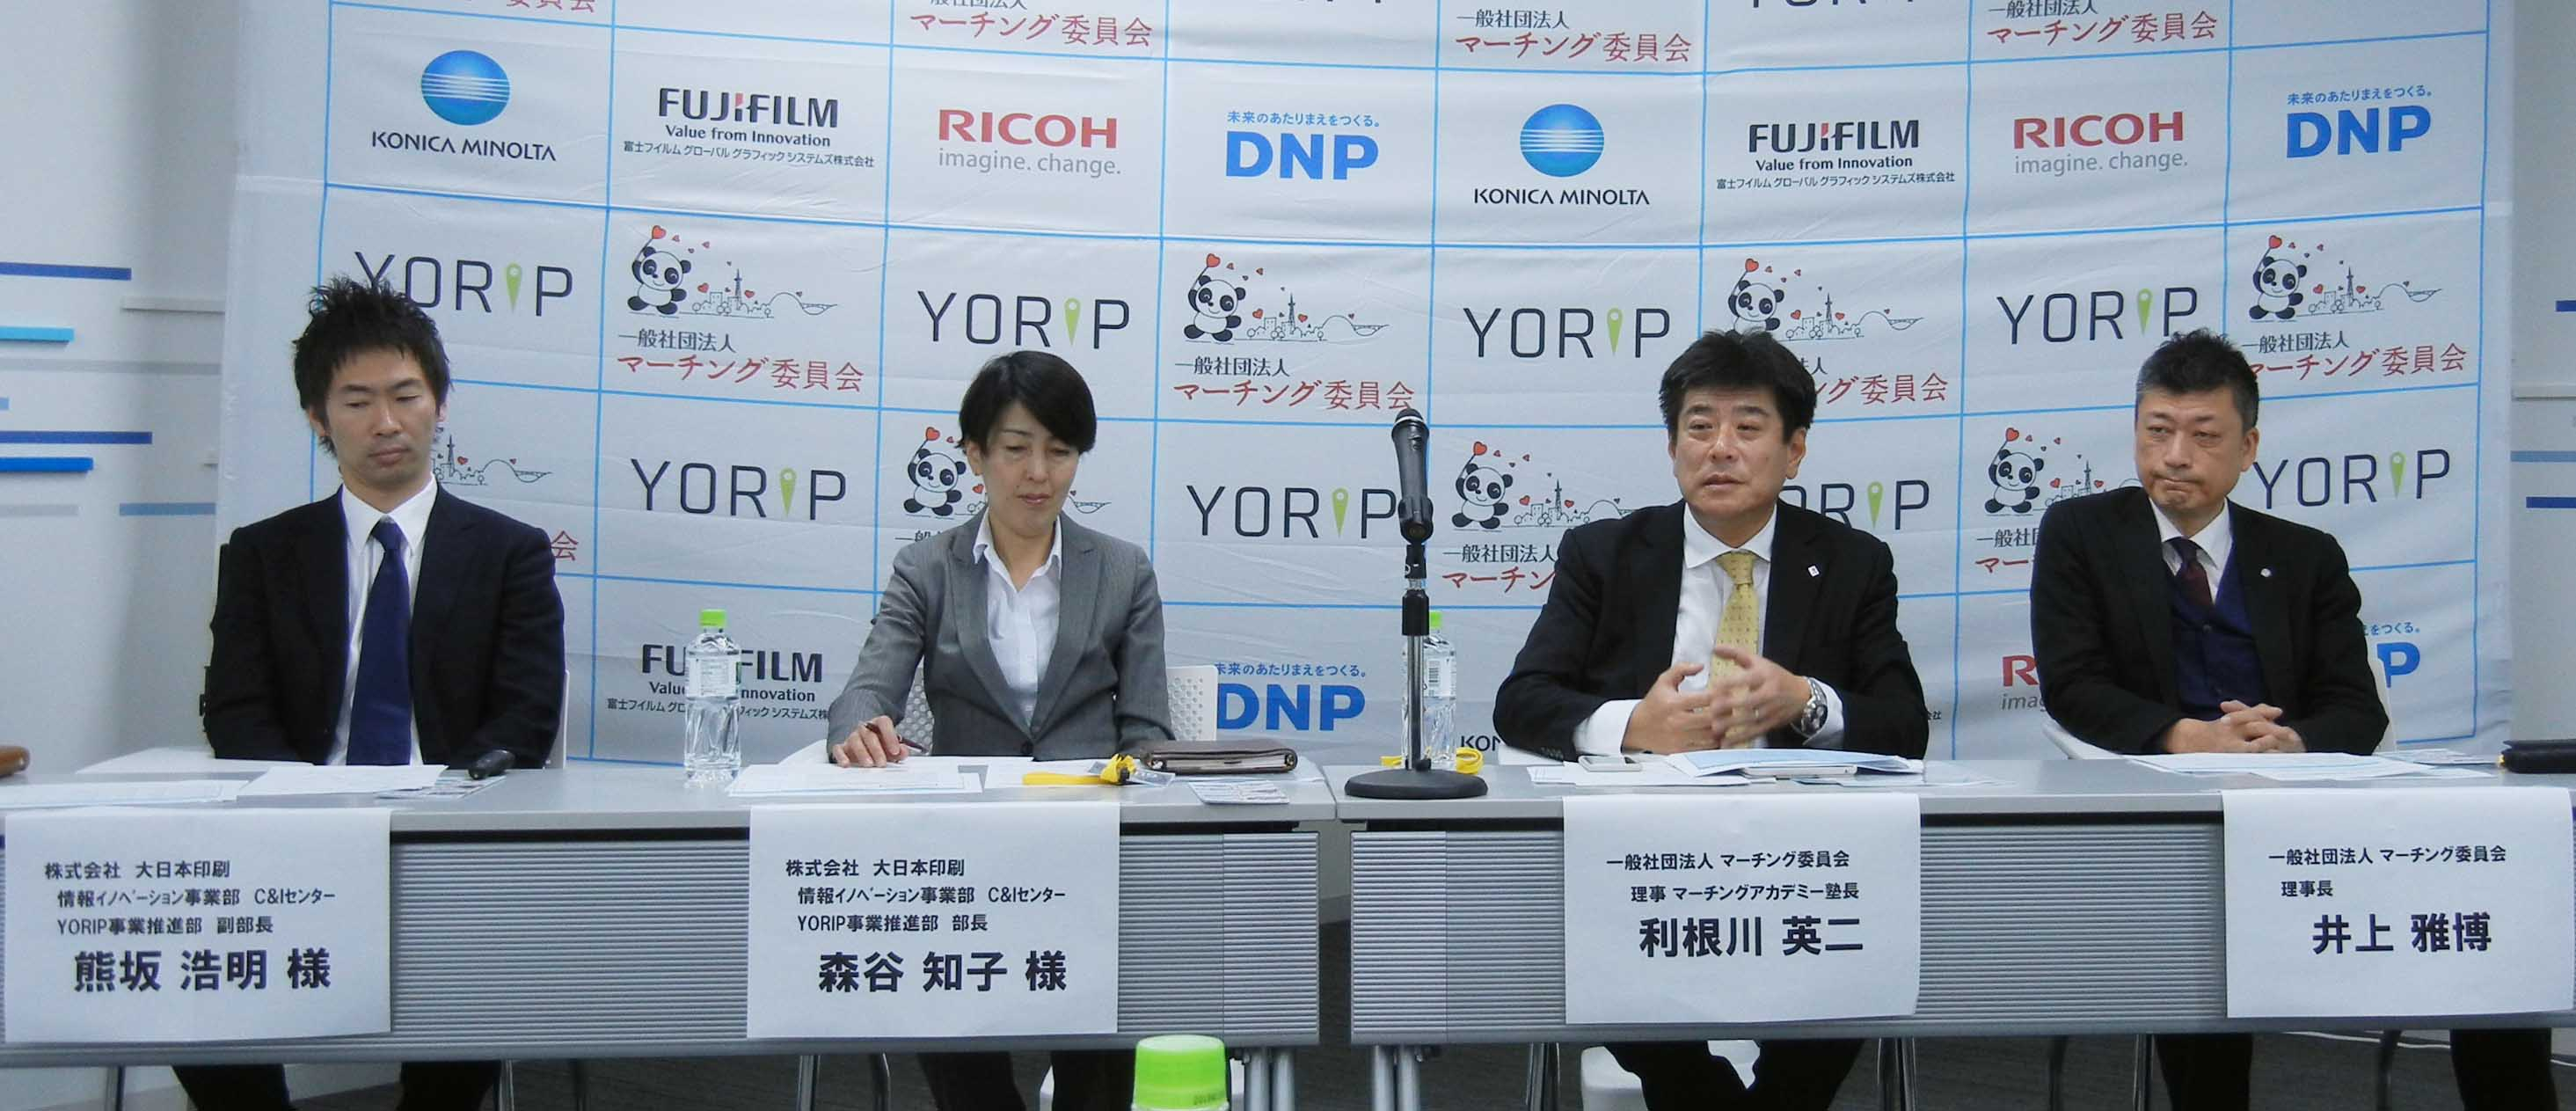 左から、DNP情報イノベーション事業部・熊坂浩明副部長、同・森谷知子部長、マーチング委員会・利根川英二塾長、同・井上雅博理事長